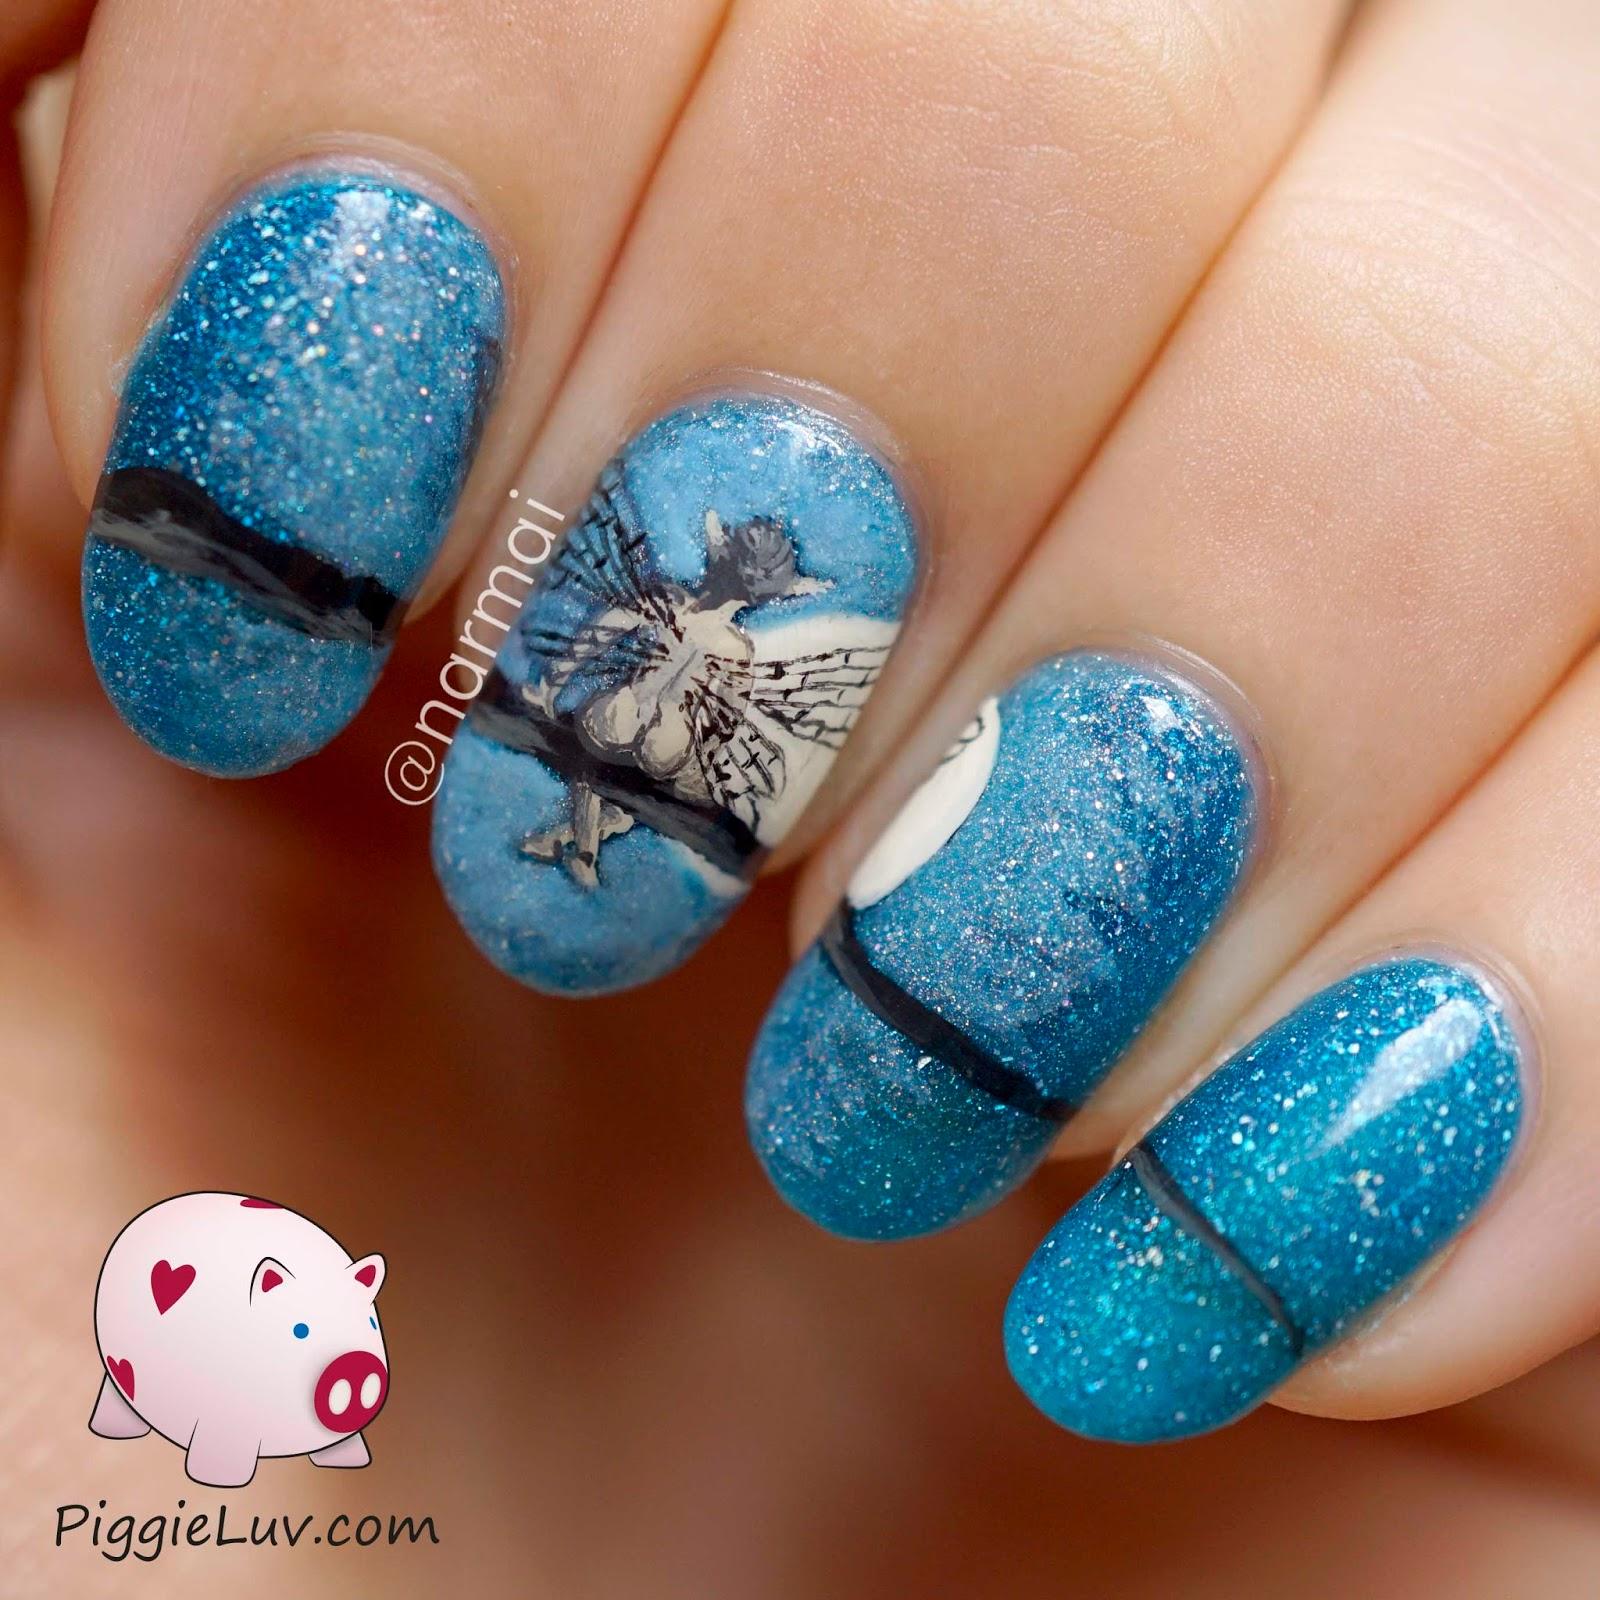 PiggieLuv: \'Cheeky\' midnight fairy nail art